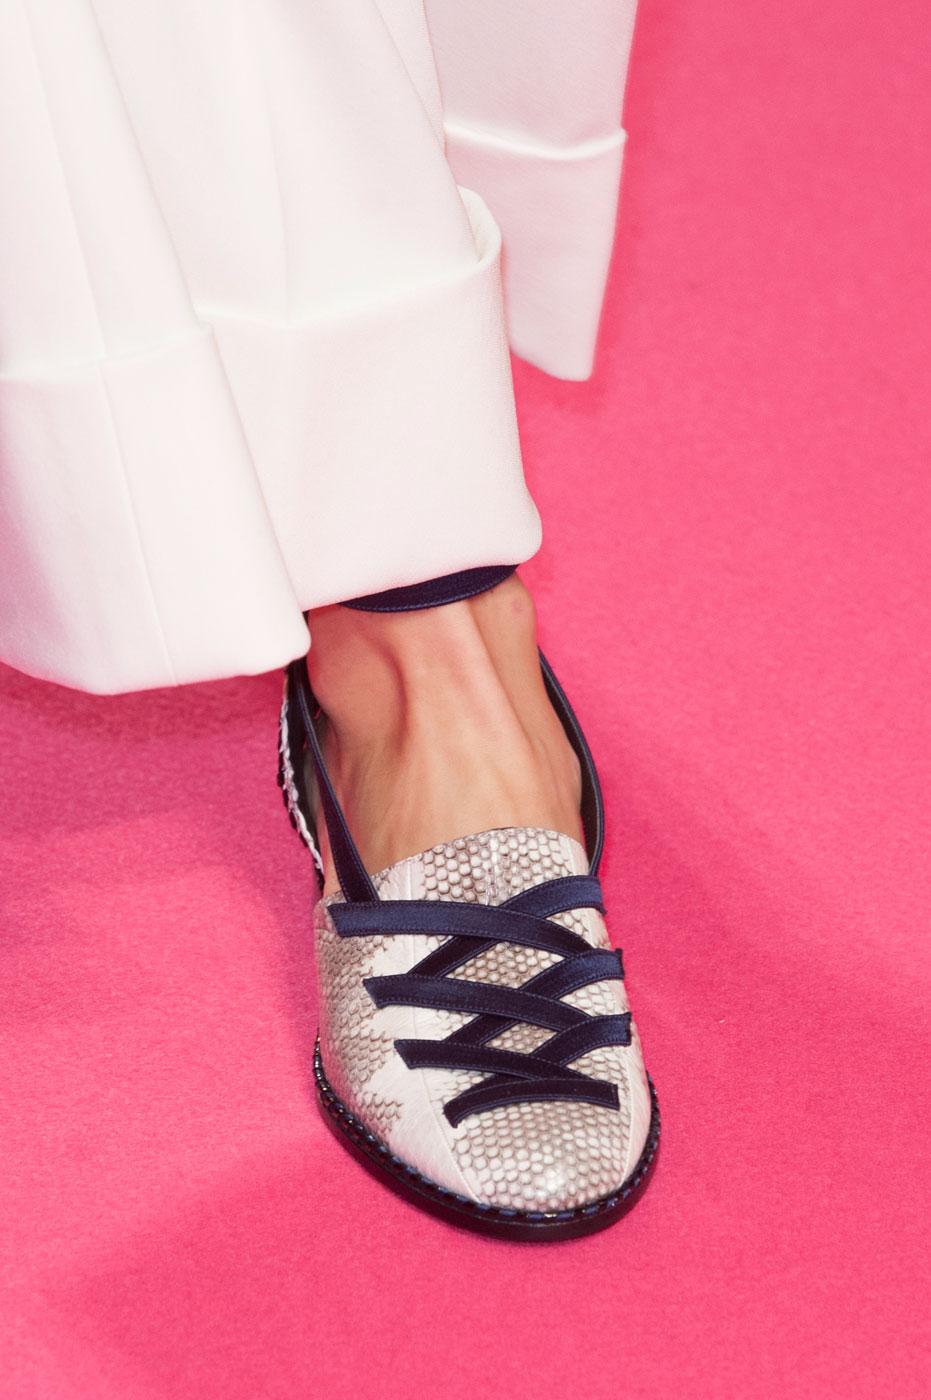 Schiaparelli-fashion-runway-show-close-ups-haute-couture-paris-spring-summer-2015-the-impression-10